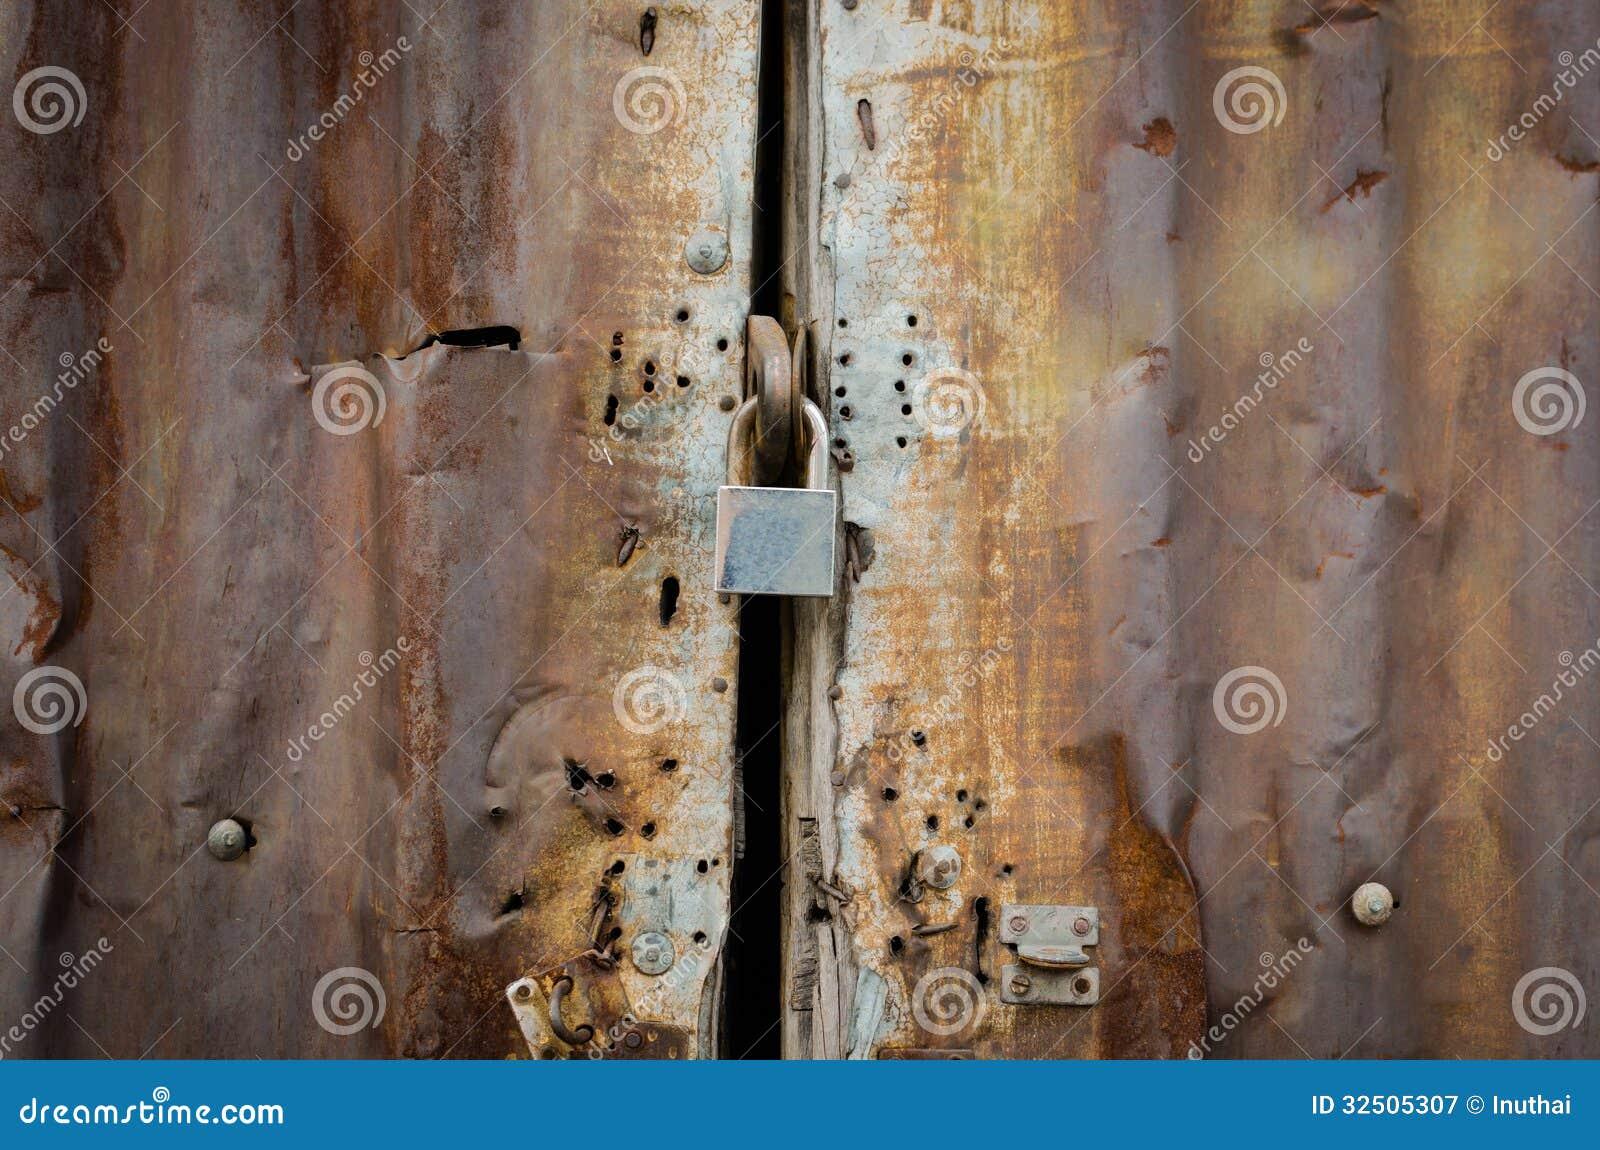 Rusty Zinc Door Lock With Key Royalty Free Stock